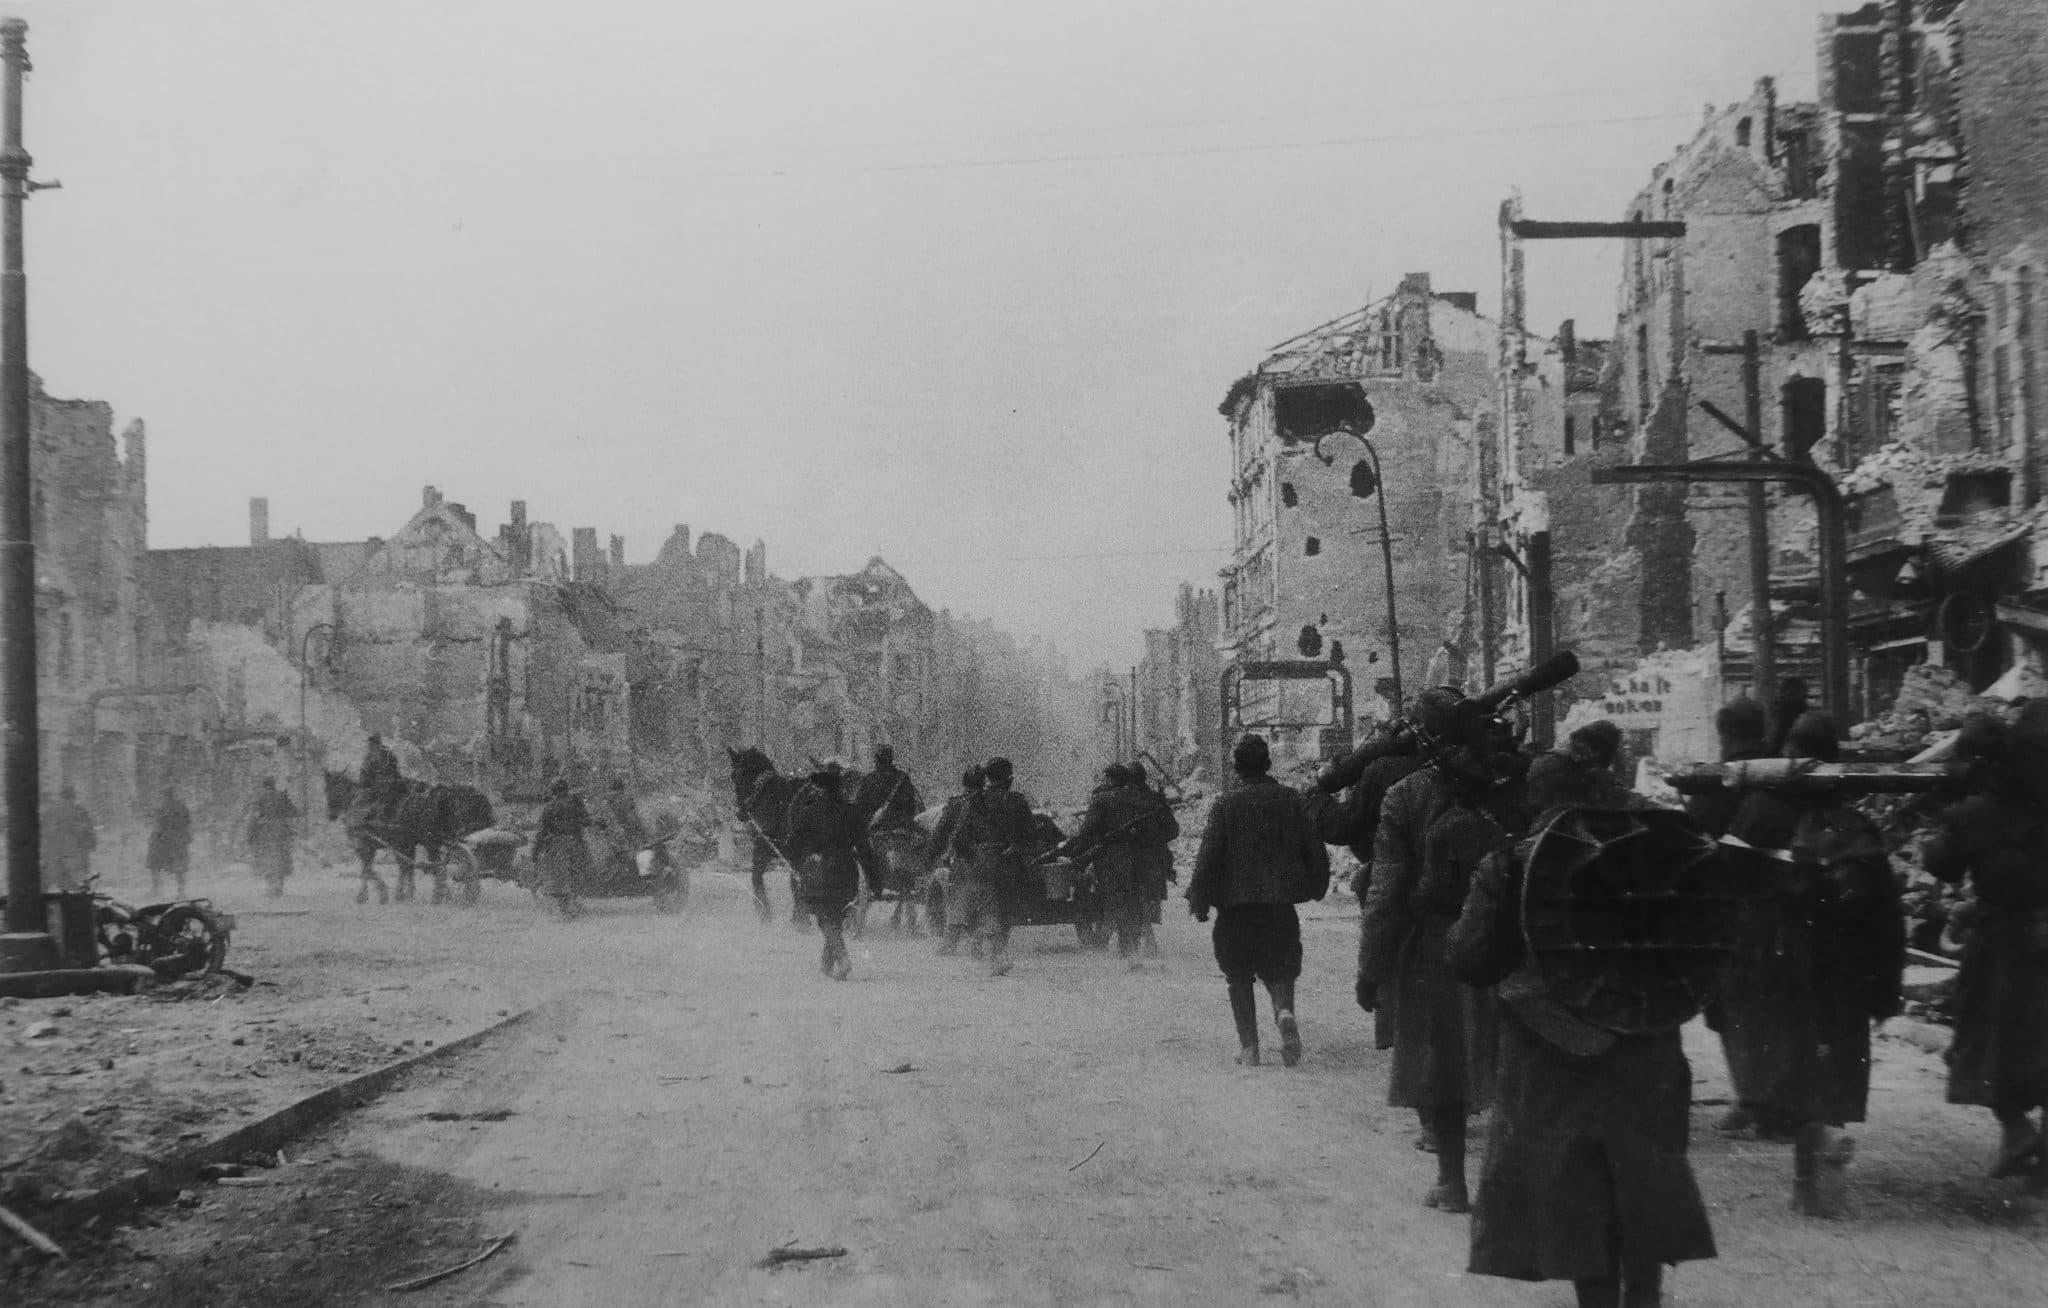 A column of Soviet artillerymen on the march along the Frankfurter Allee in Berlin